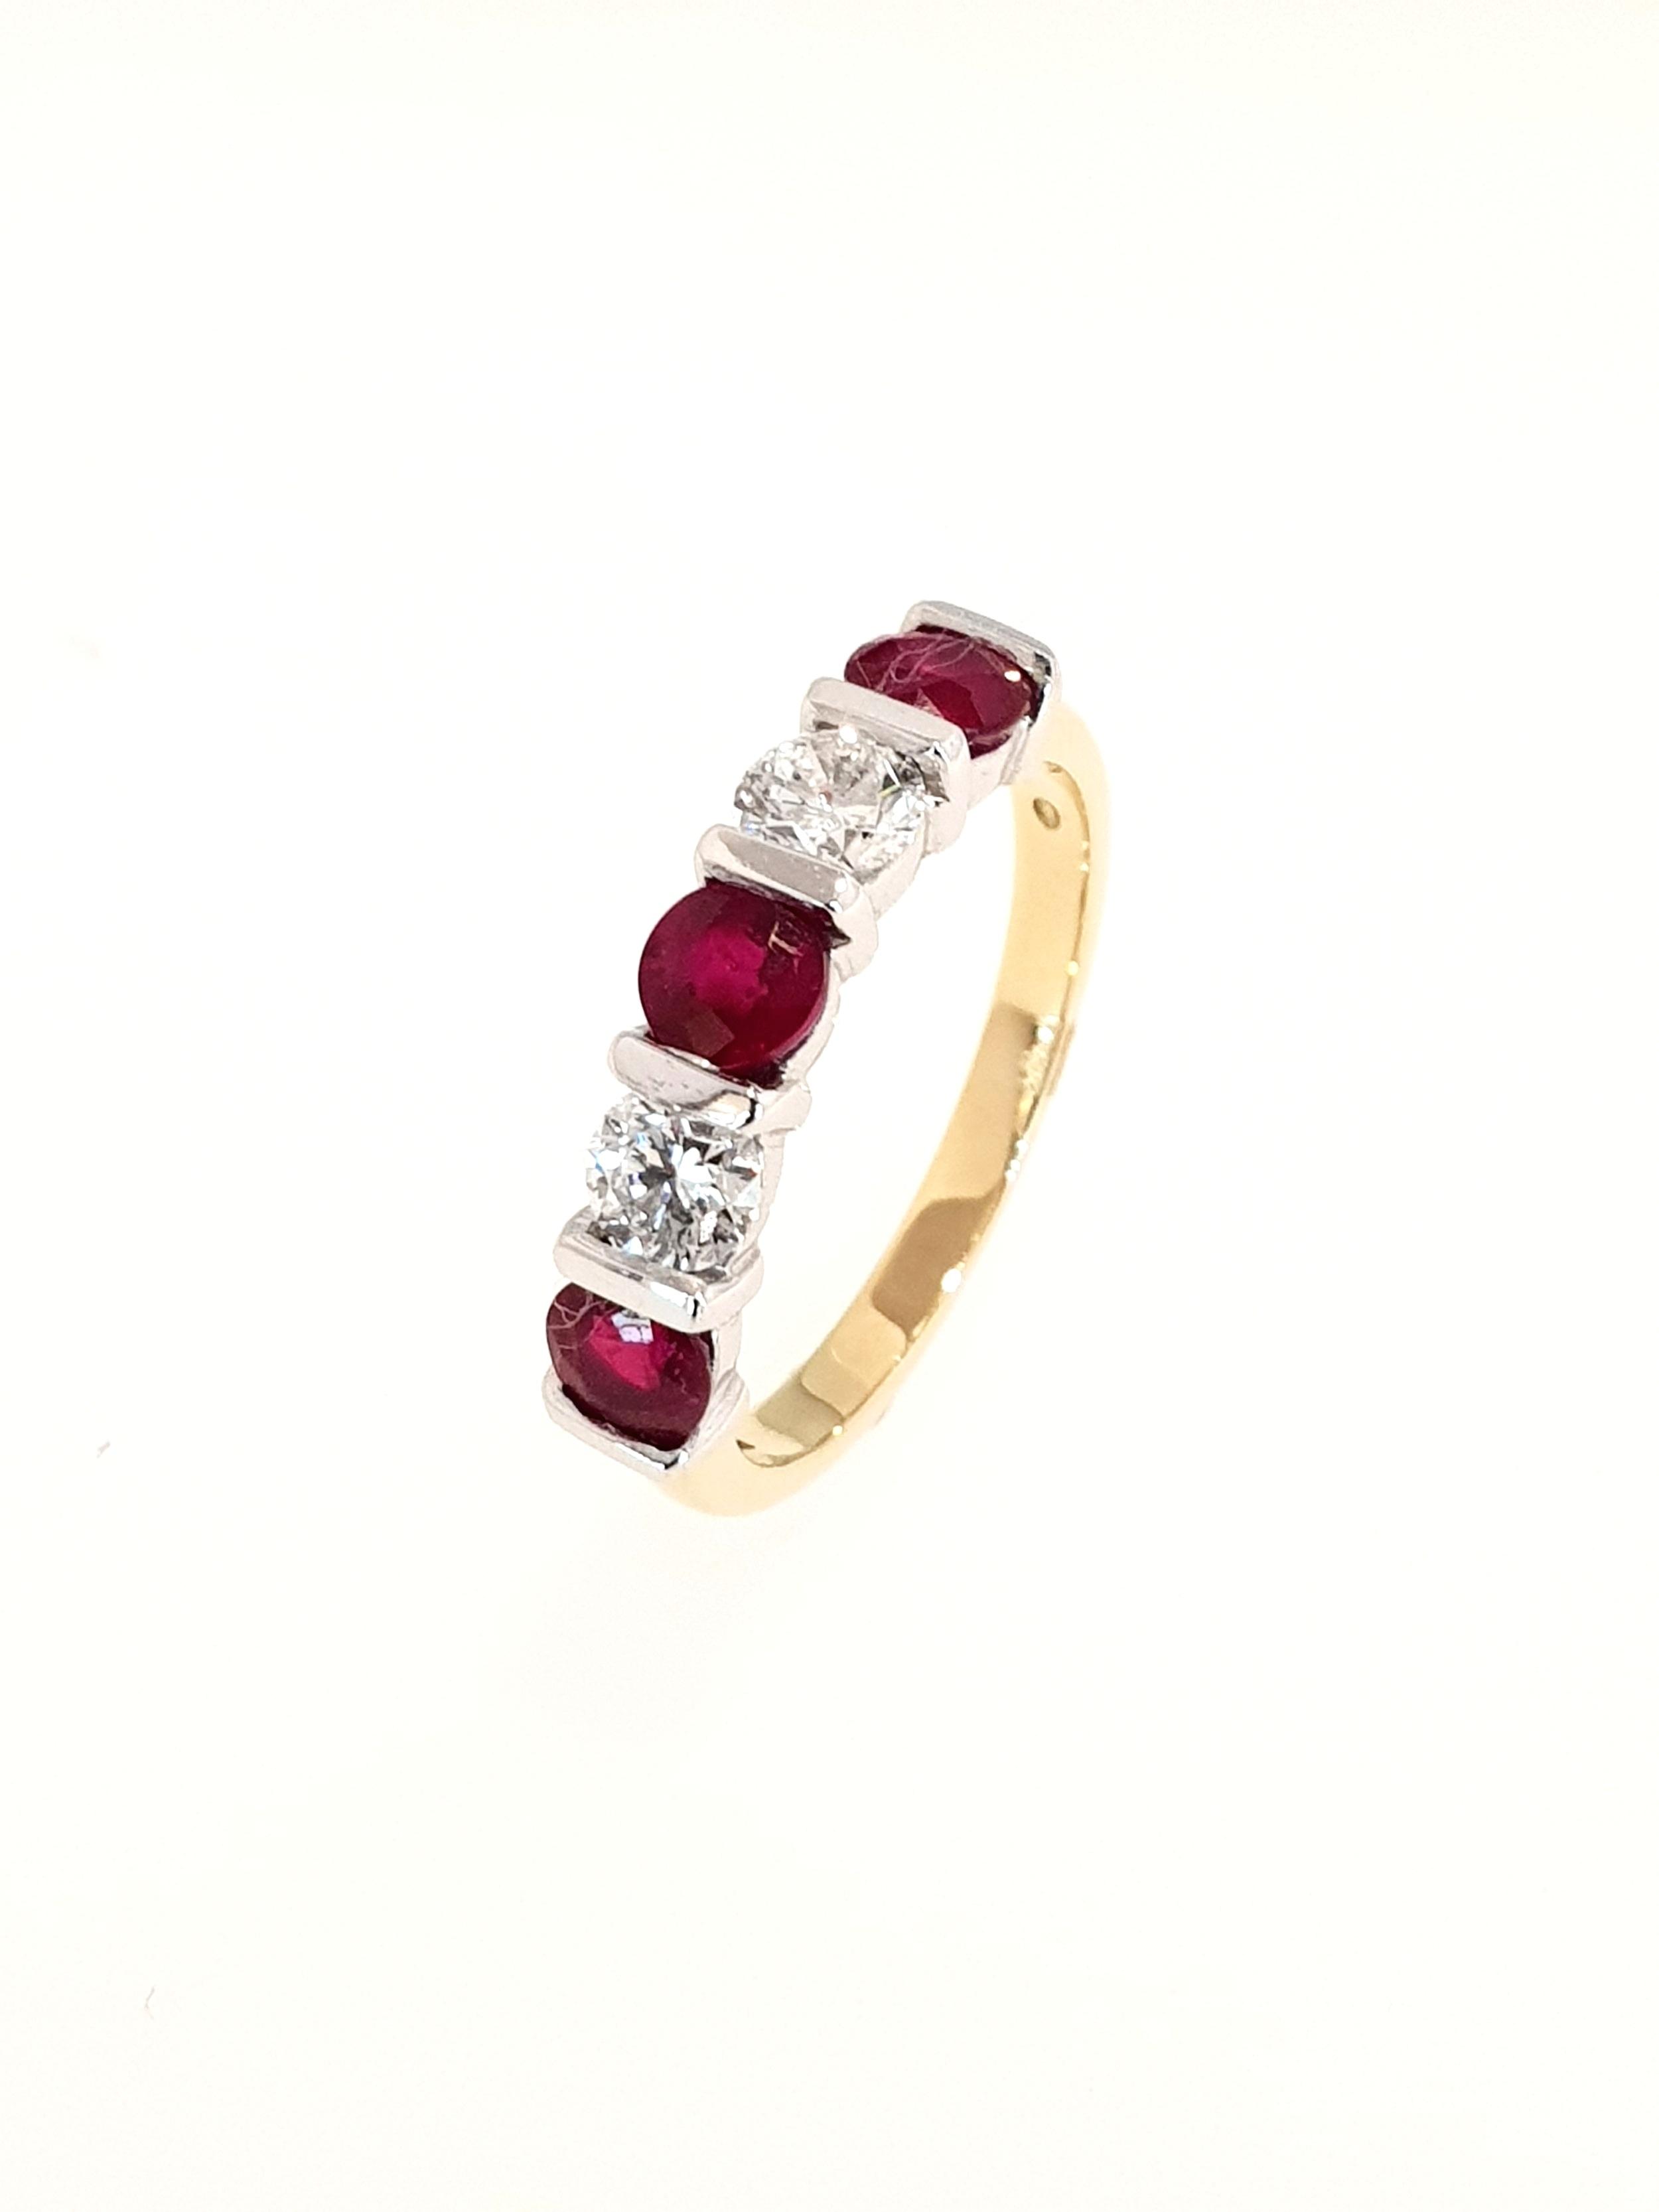 18ct Yellow Gold Ruby(1.15ct) & Diamond Ring  Diamond: .51ct, G, Si1  Stock Code: N8981  £3650